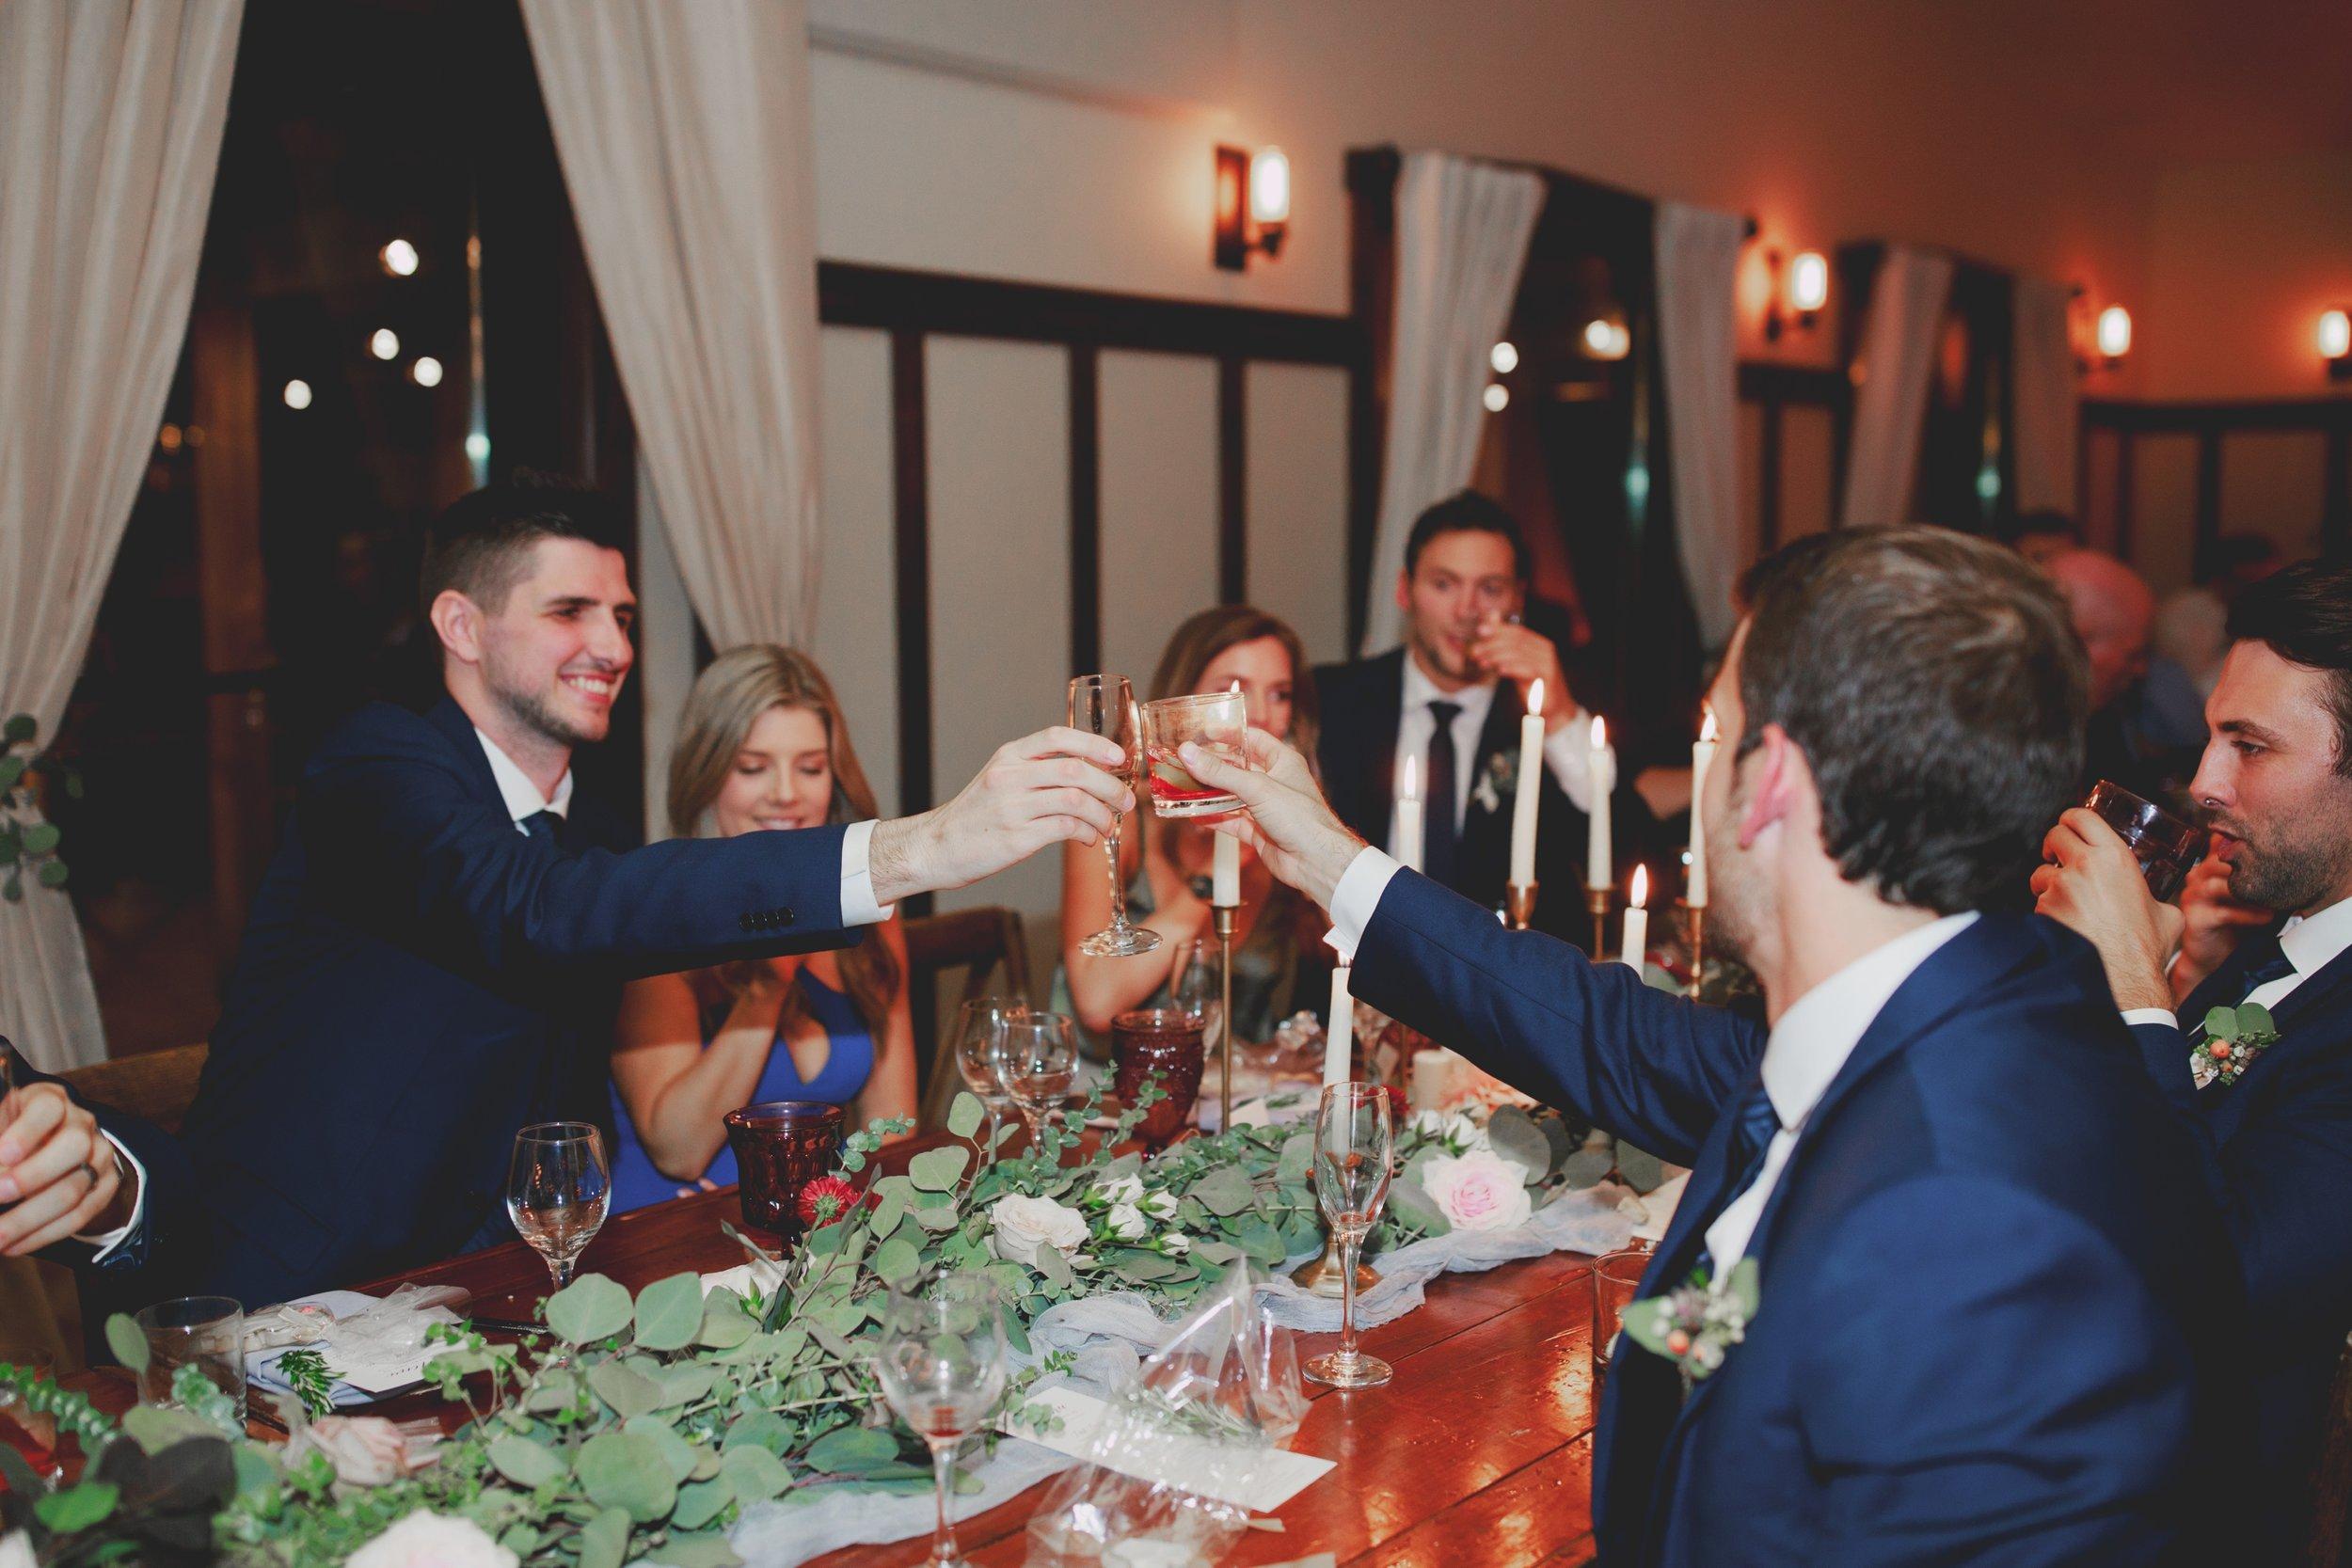 traverse_city_wedding_153.jpg